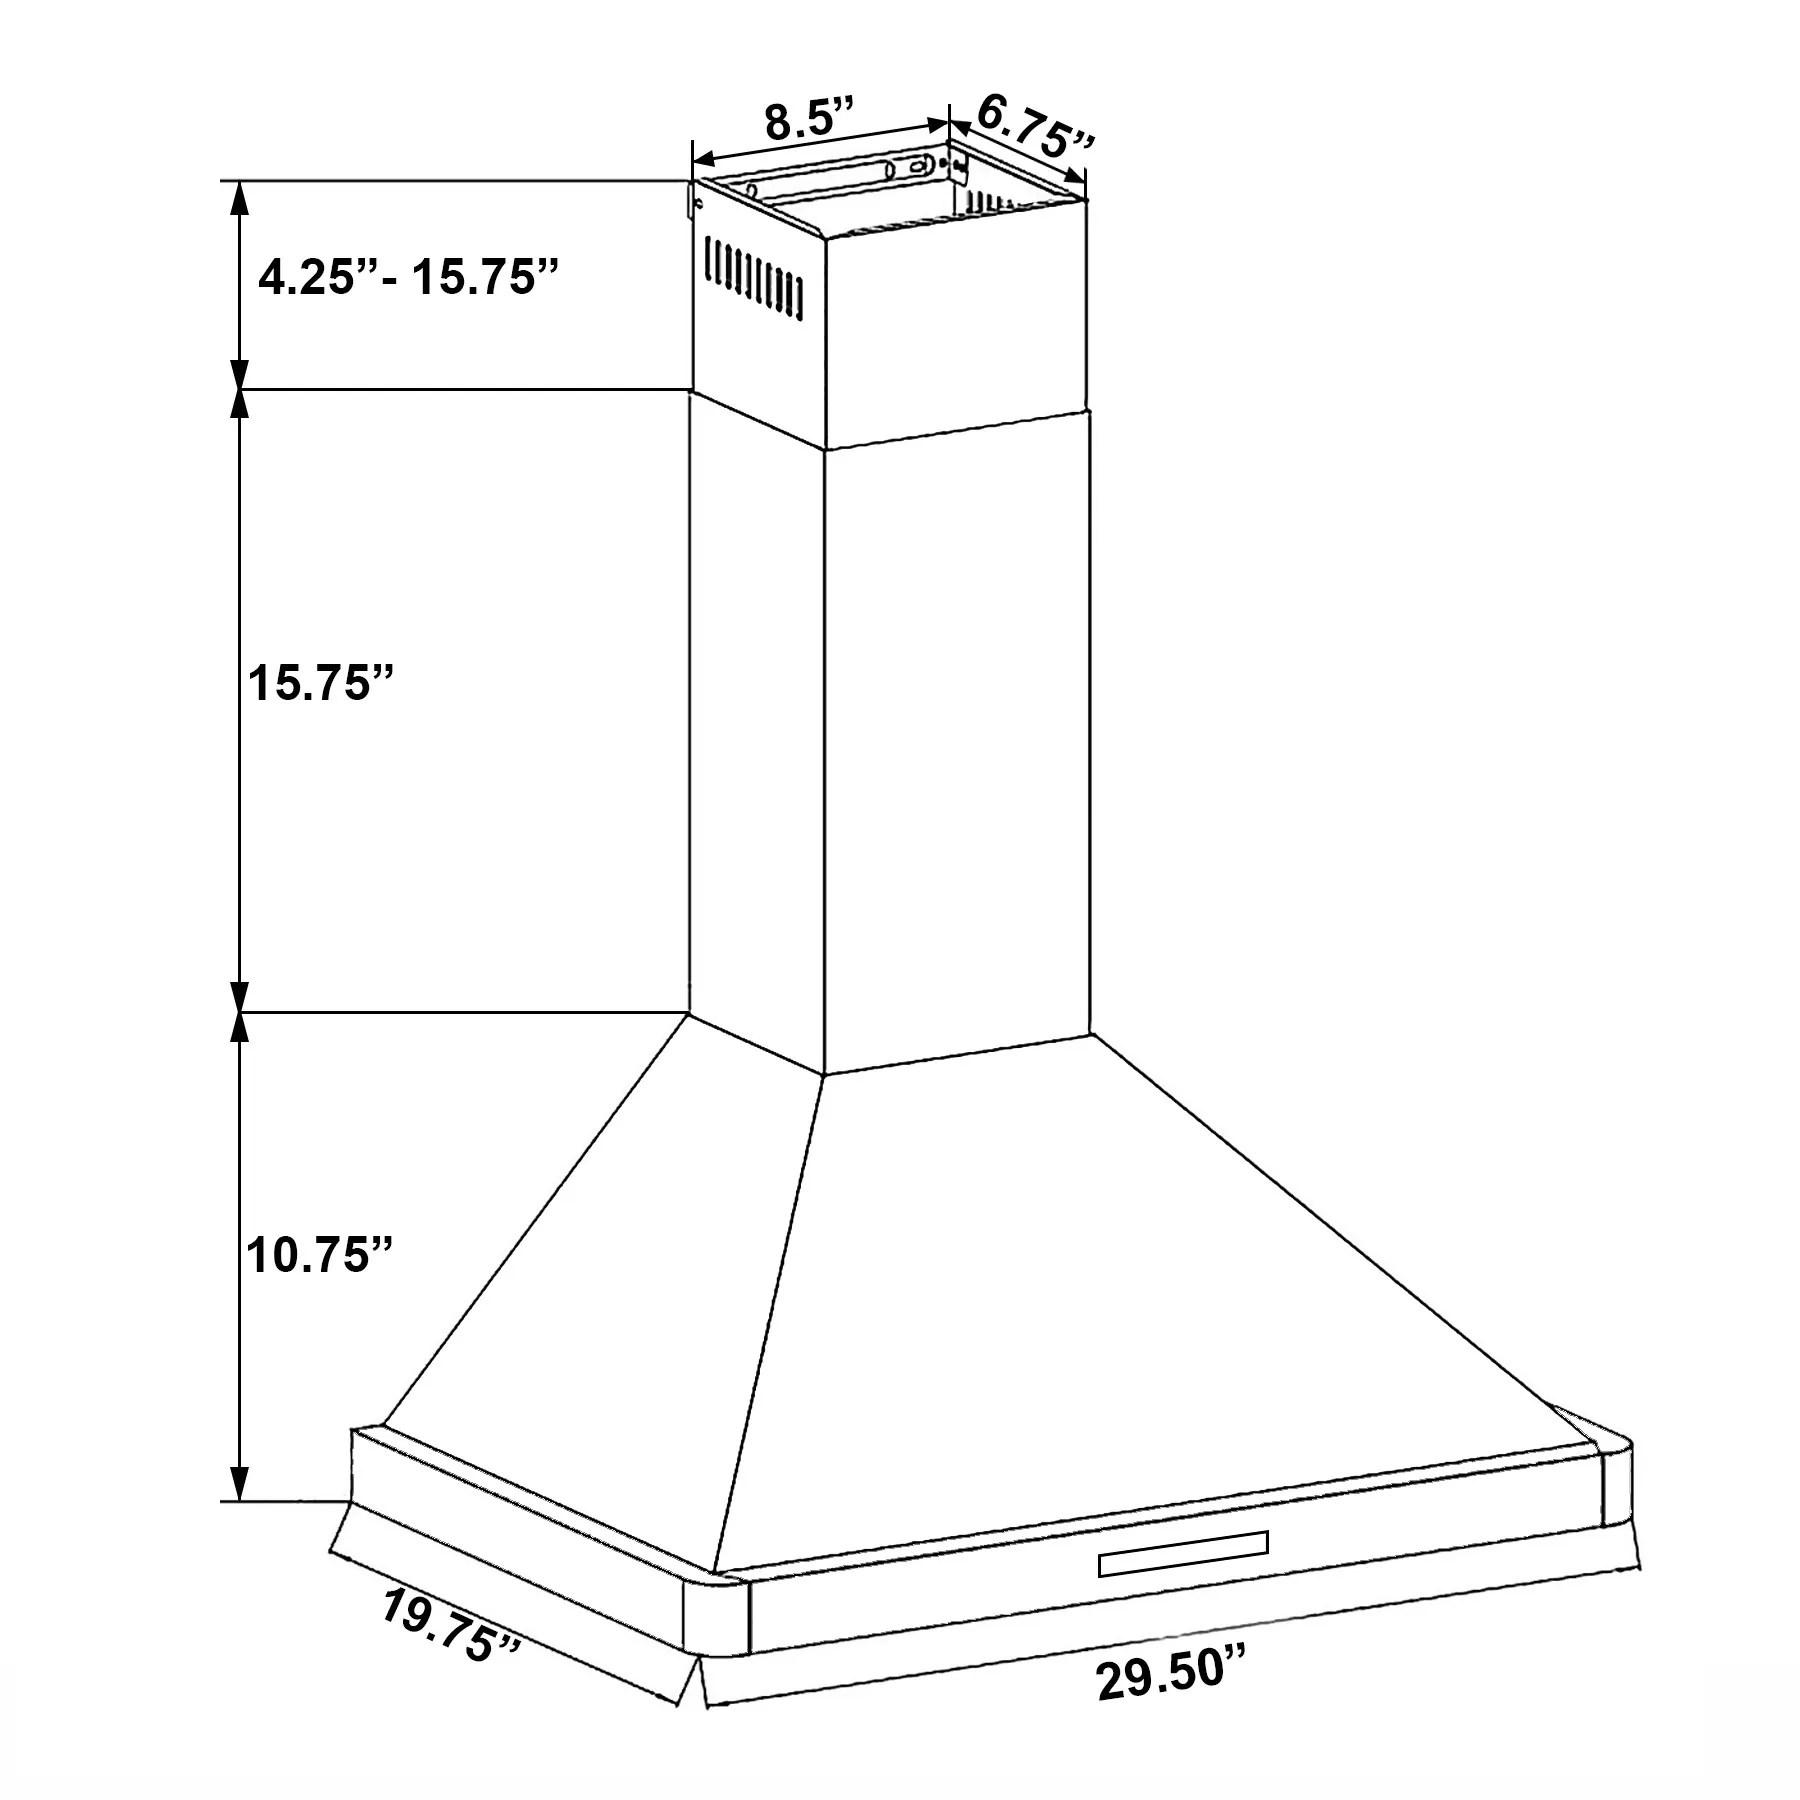 hight resolution of shop akdy 30 stainless steel black finish wall mount kitchen range thermador range wiring akdy range hood wiring diagram